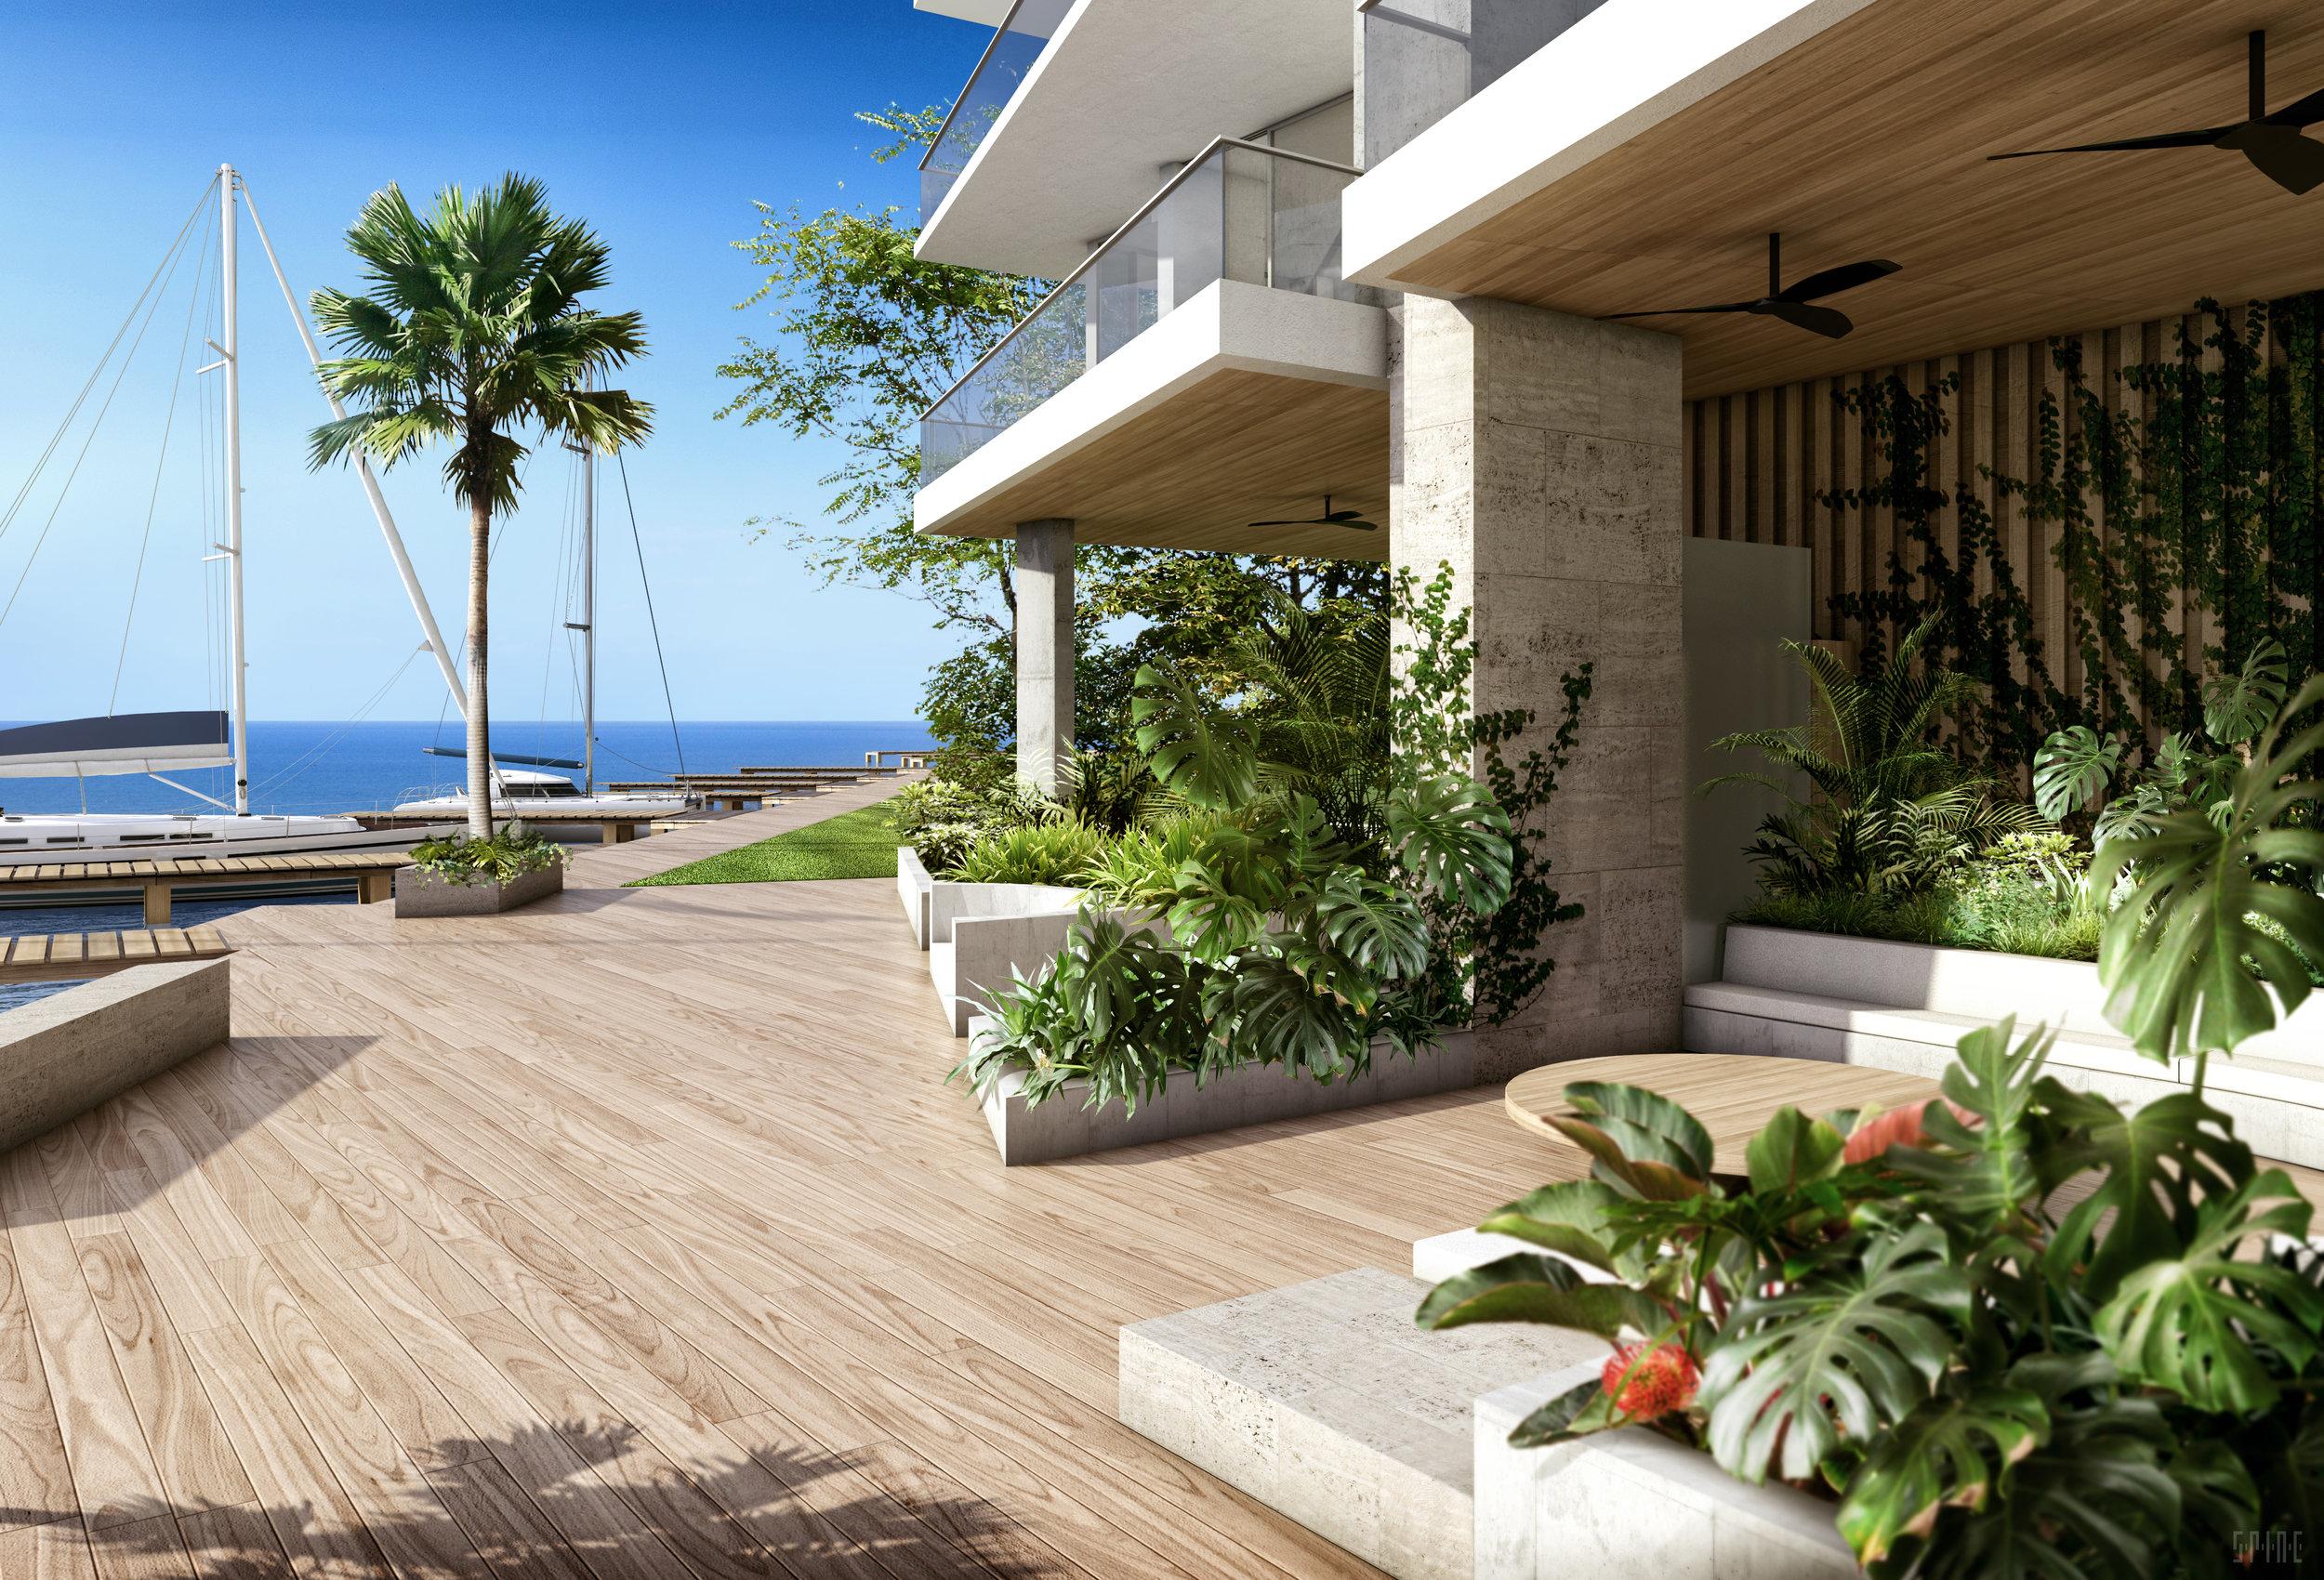 ROVR Development Closes $27 Million Construction Loan For The Fairchild Coconut Grove